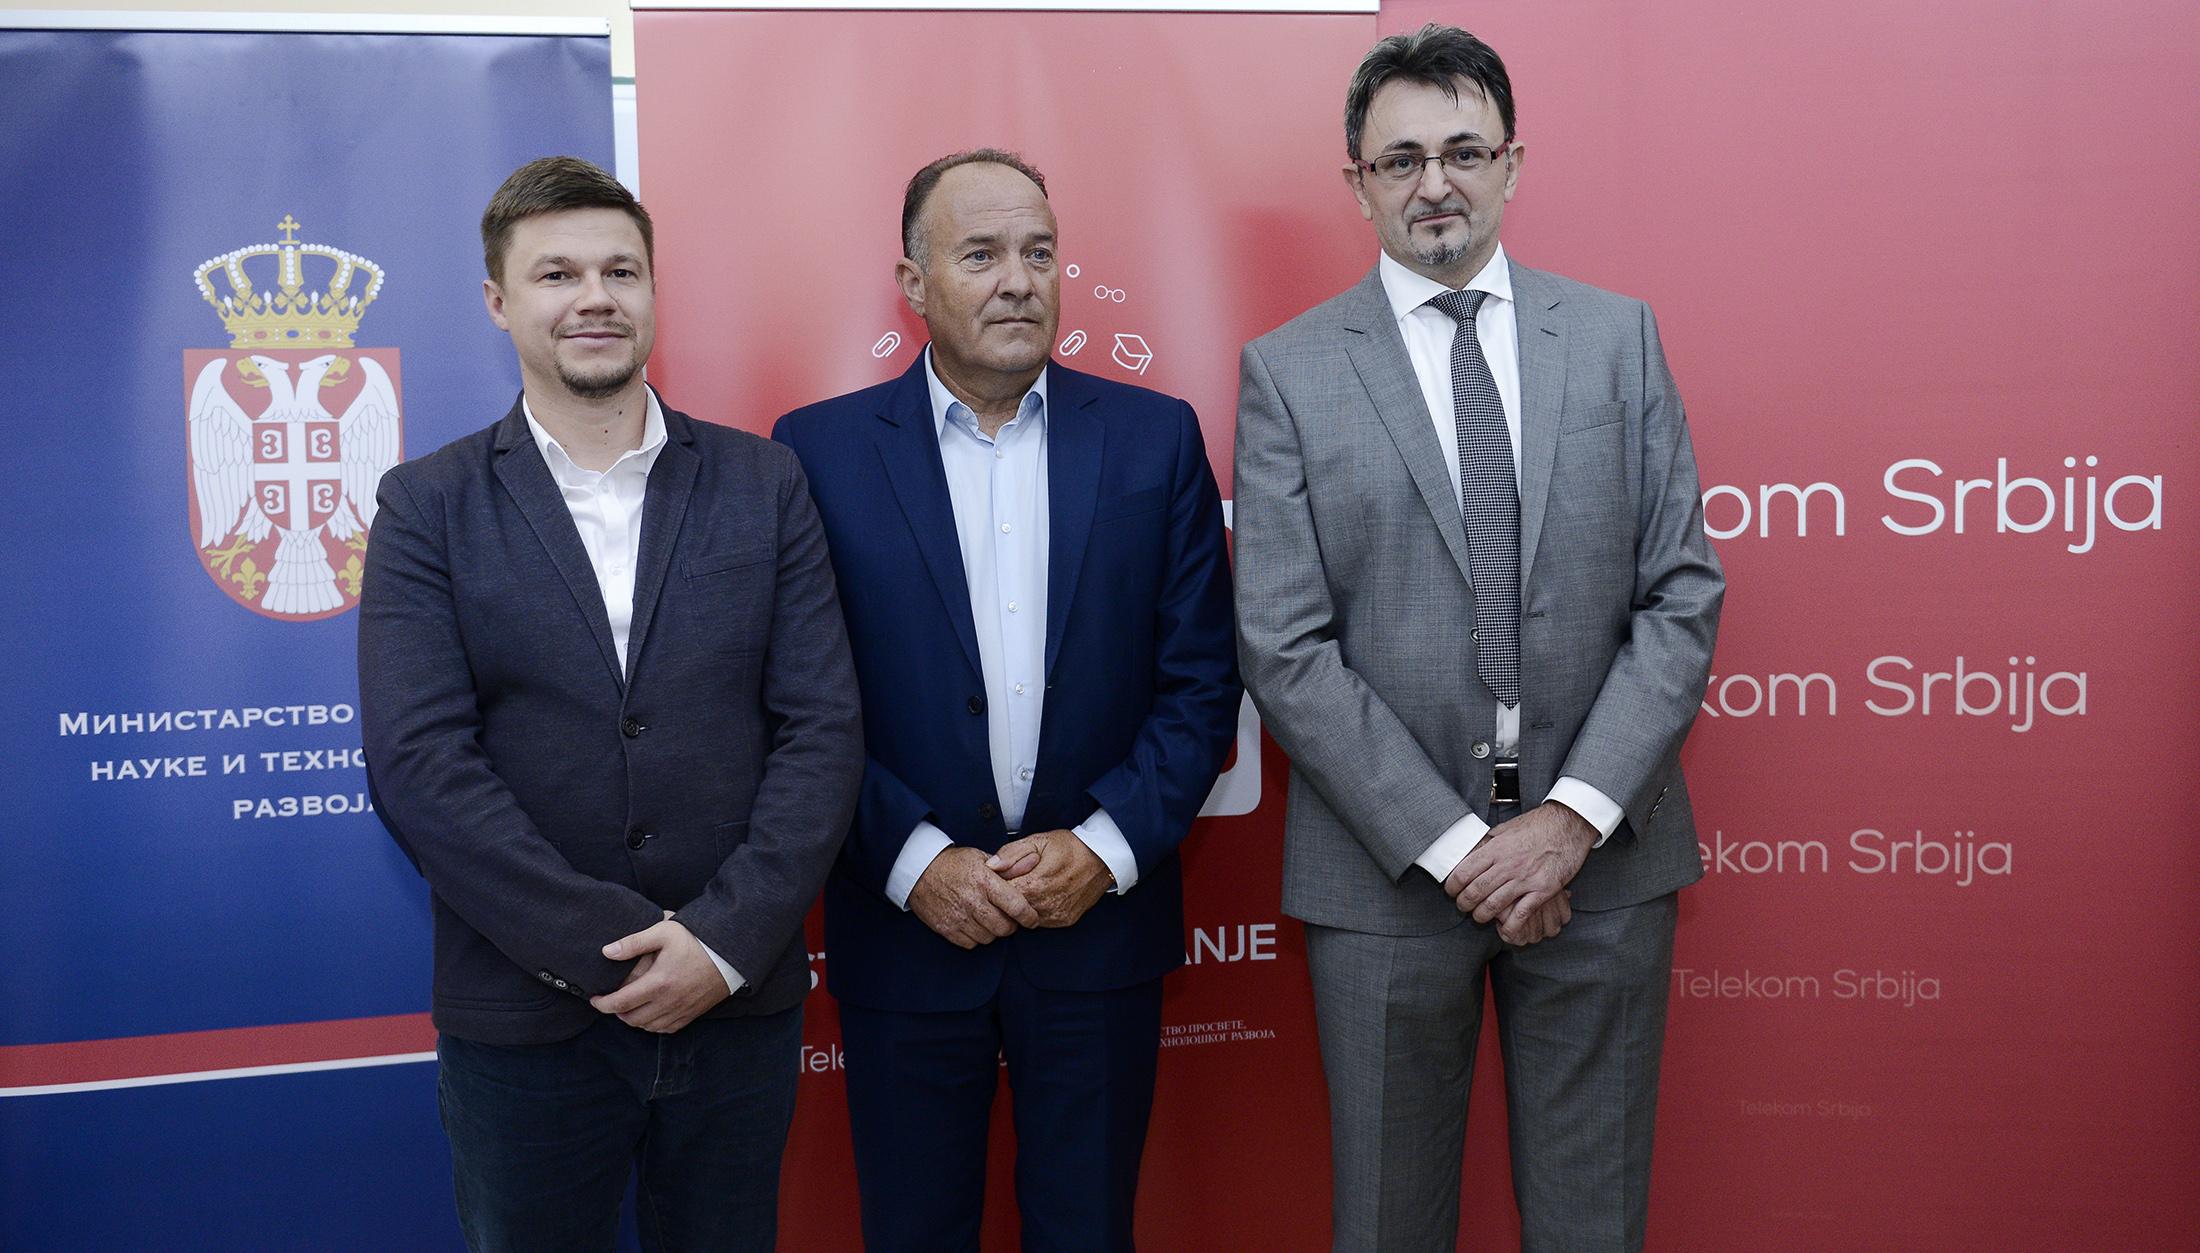 Direktor škole Valentin Sekereš, ministar Mladen Šarčević i direktor Telekoma Srbija Predrag Ćulibrk